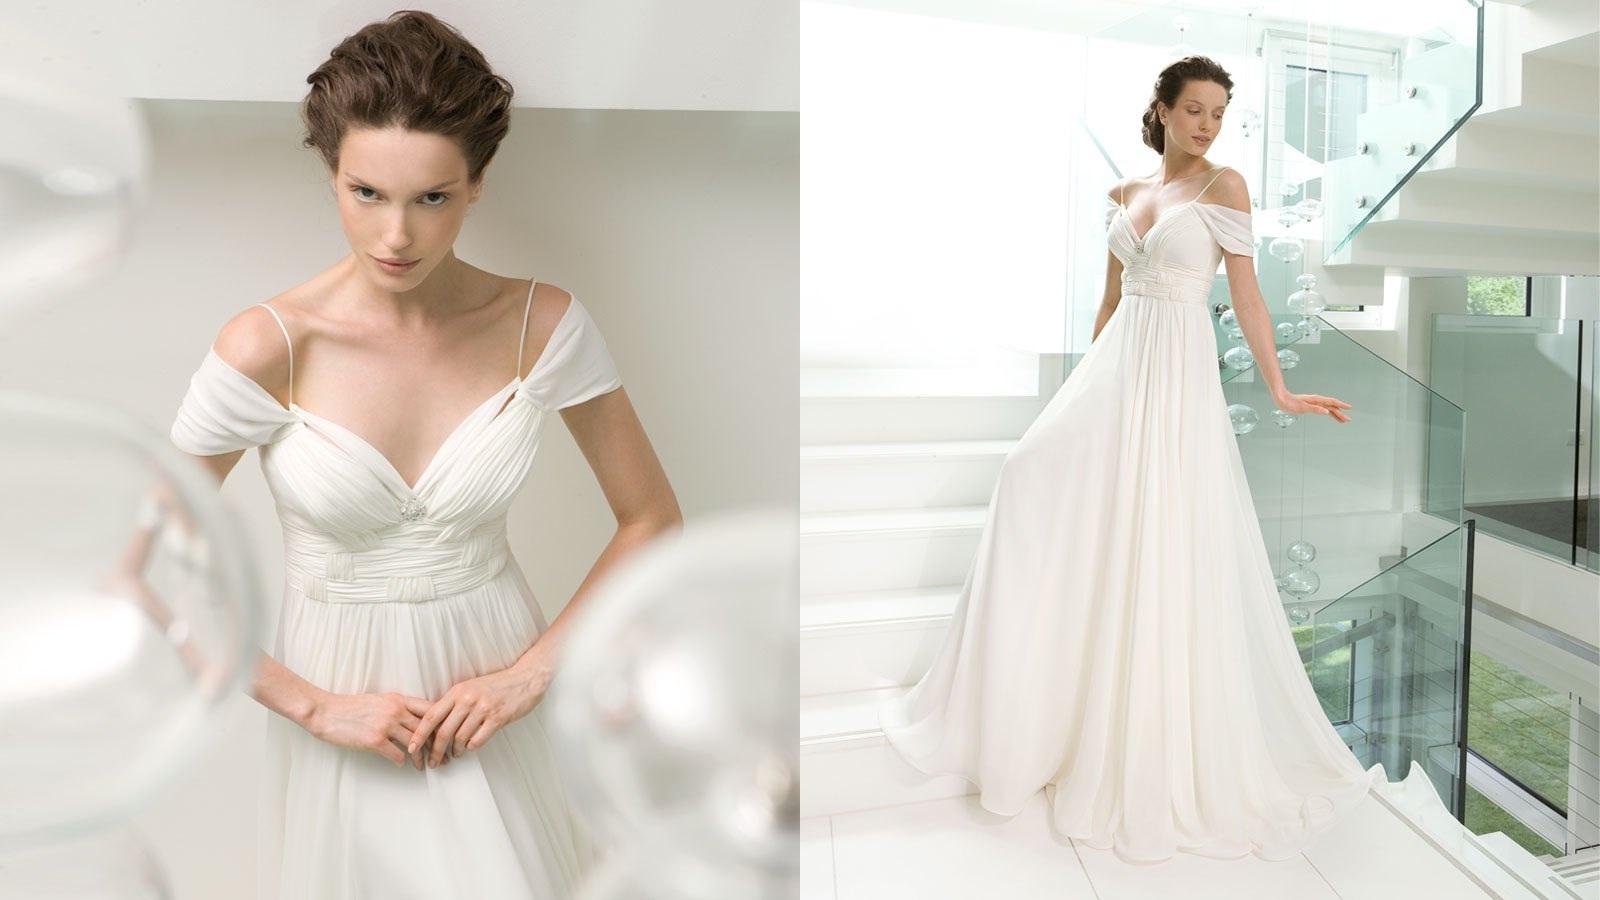 Pret a porter atelier aimee 2013 bridal wedding dresses for Pret a porter